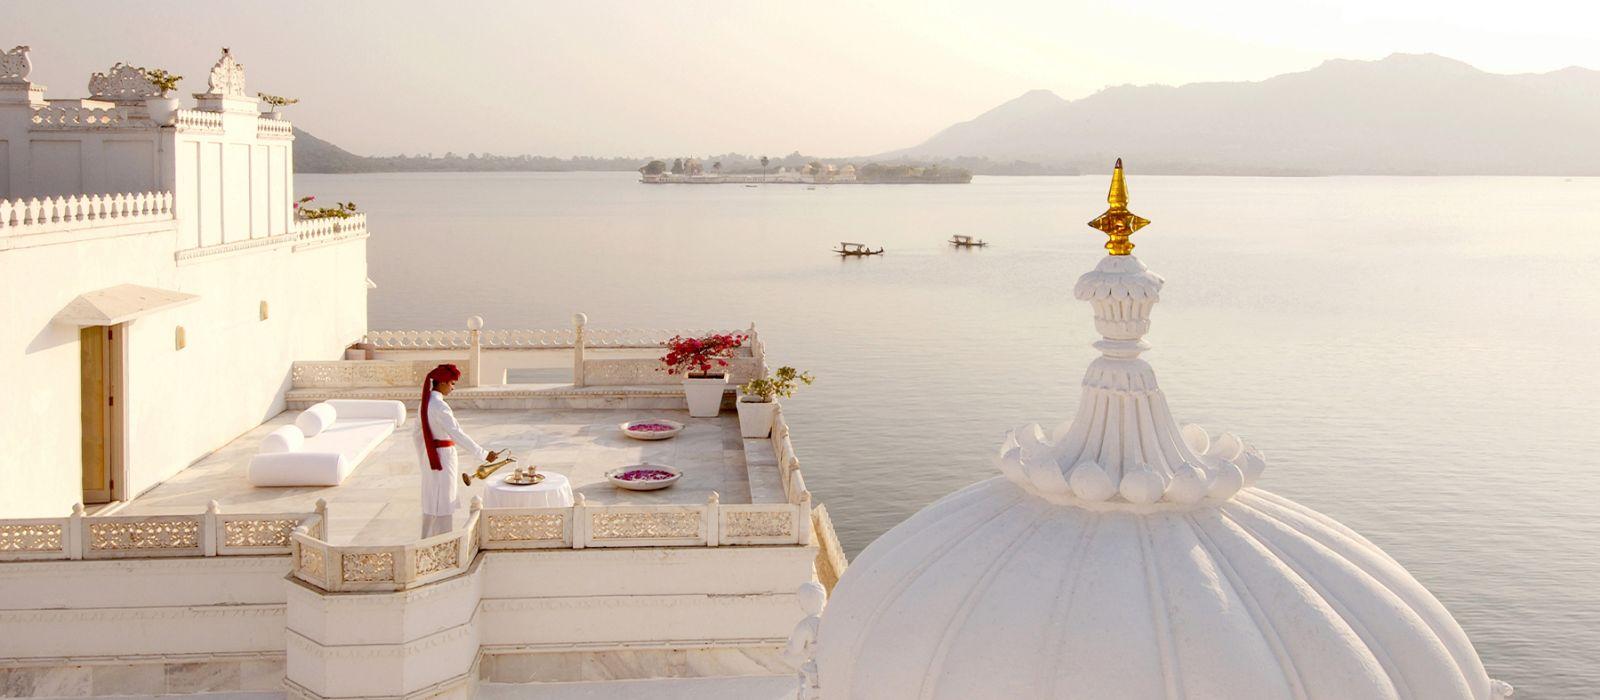 Regal and Spiritual North India Tour Trip 2